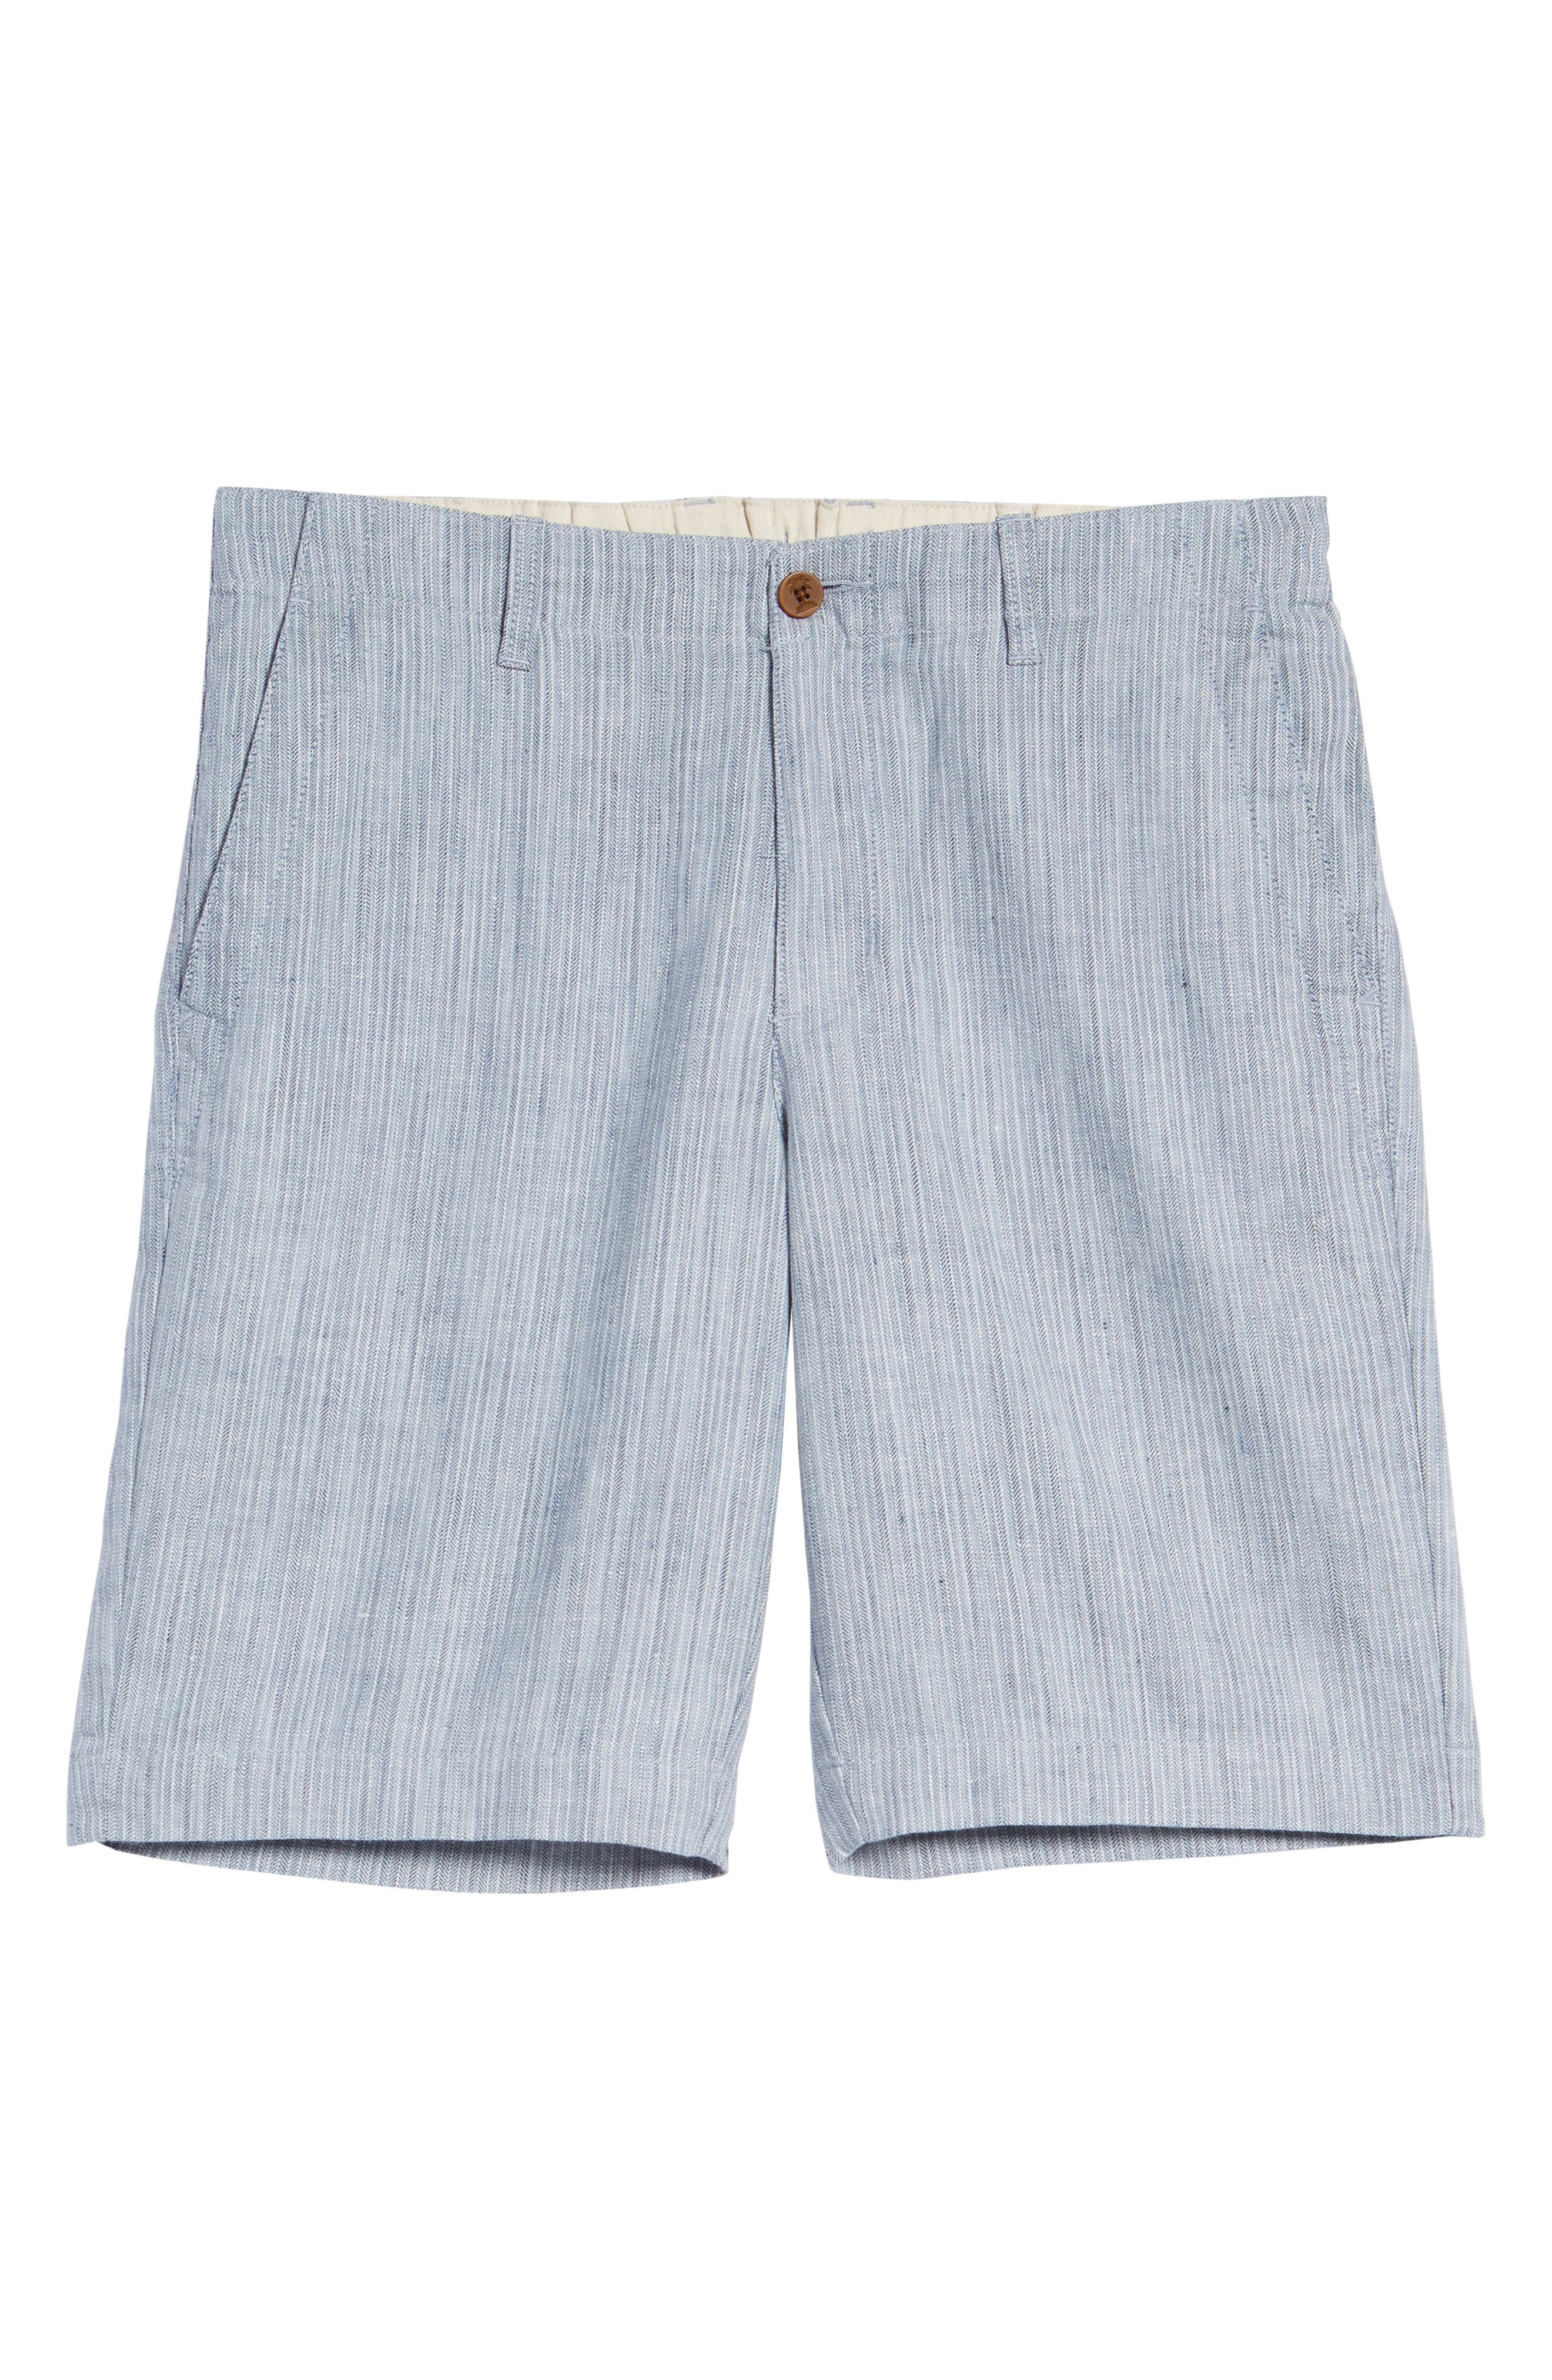 Harbor Herringbone Linen Blend Shorts,                             Alternate thumbnail 6, color,                             CHAMBRAY